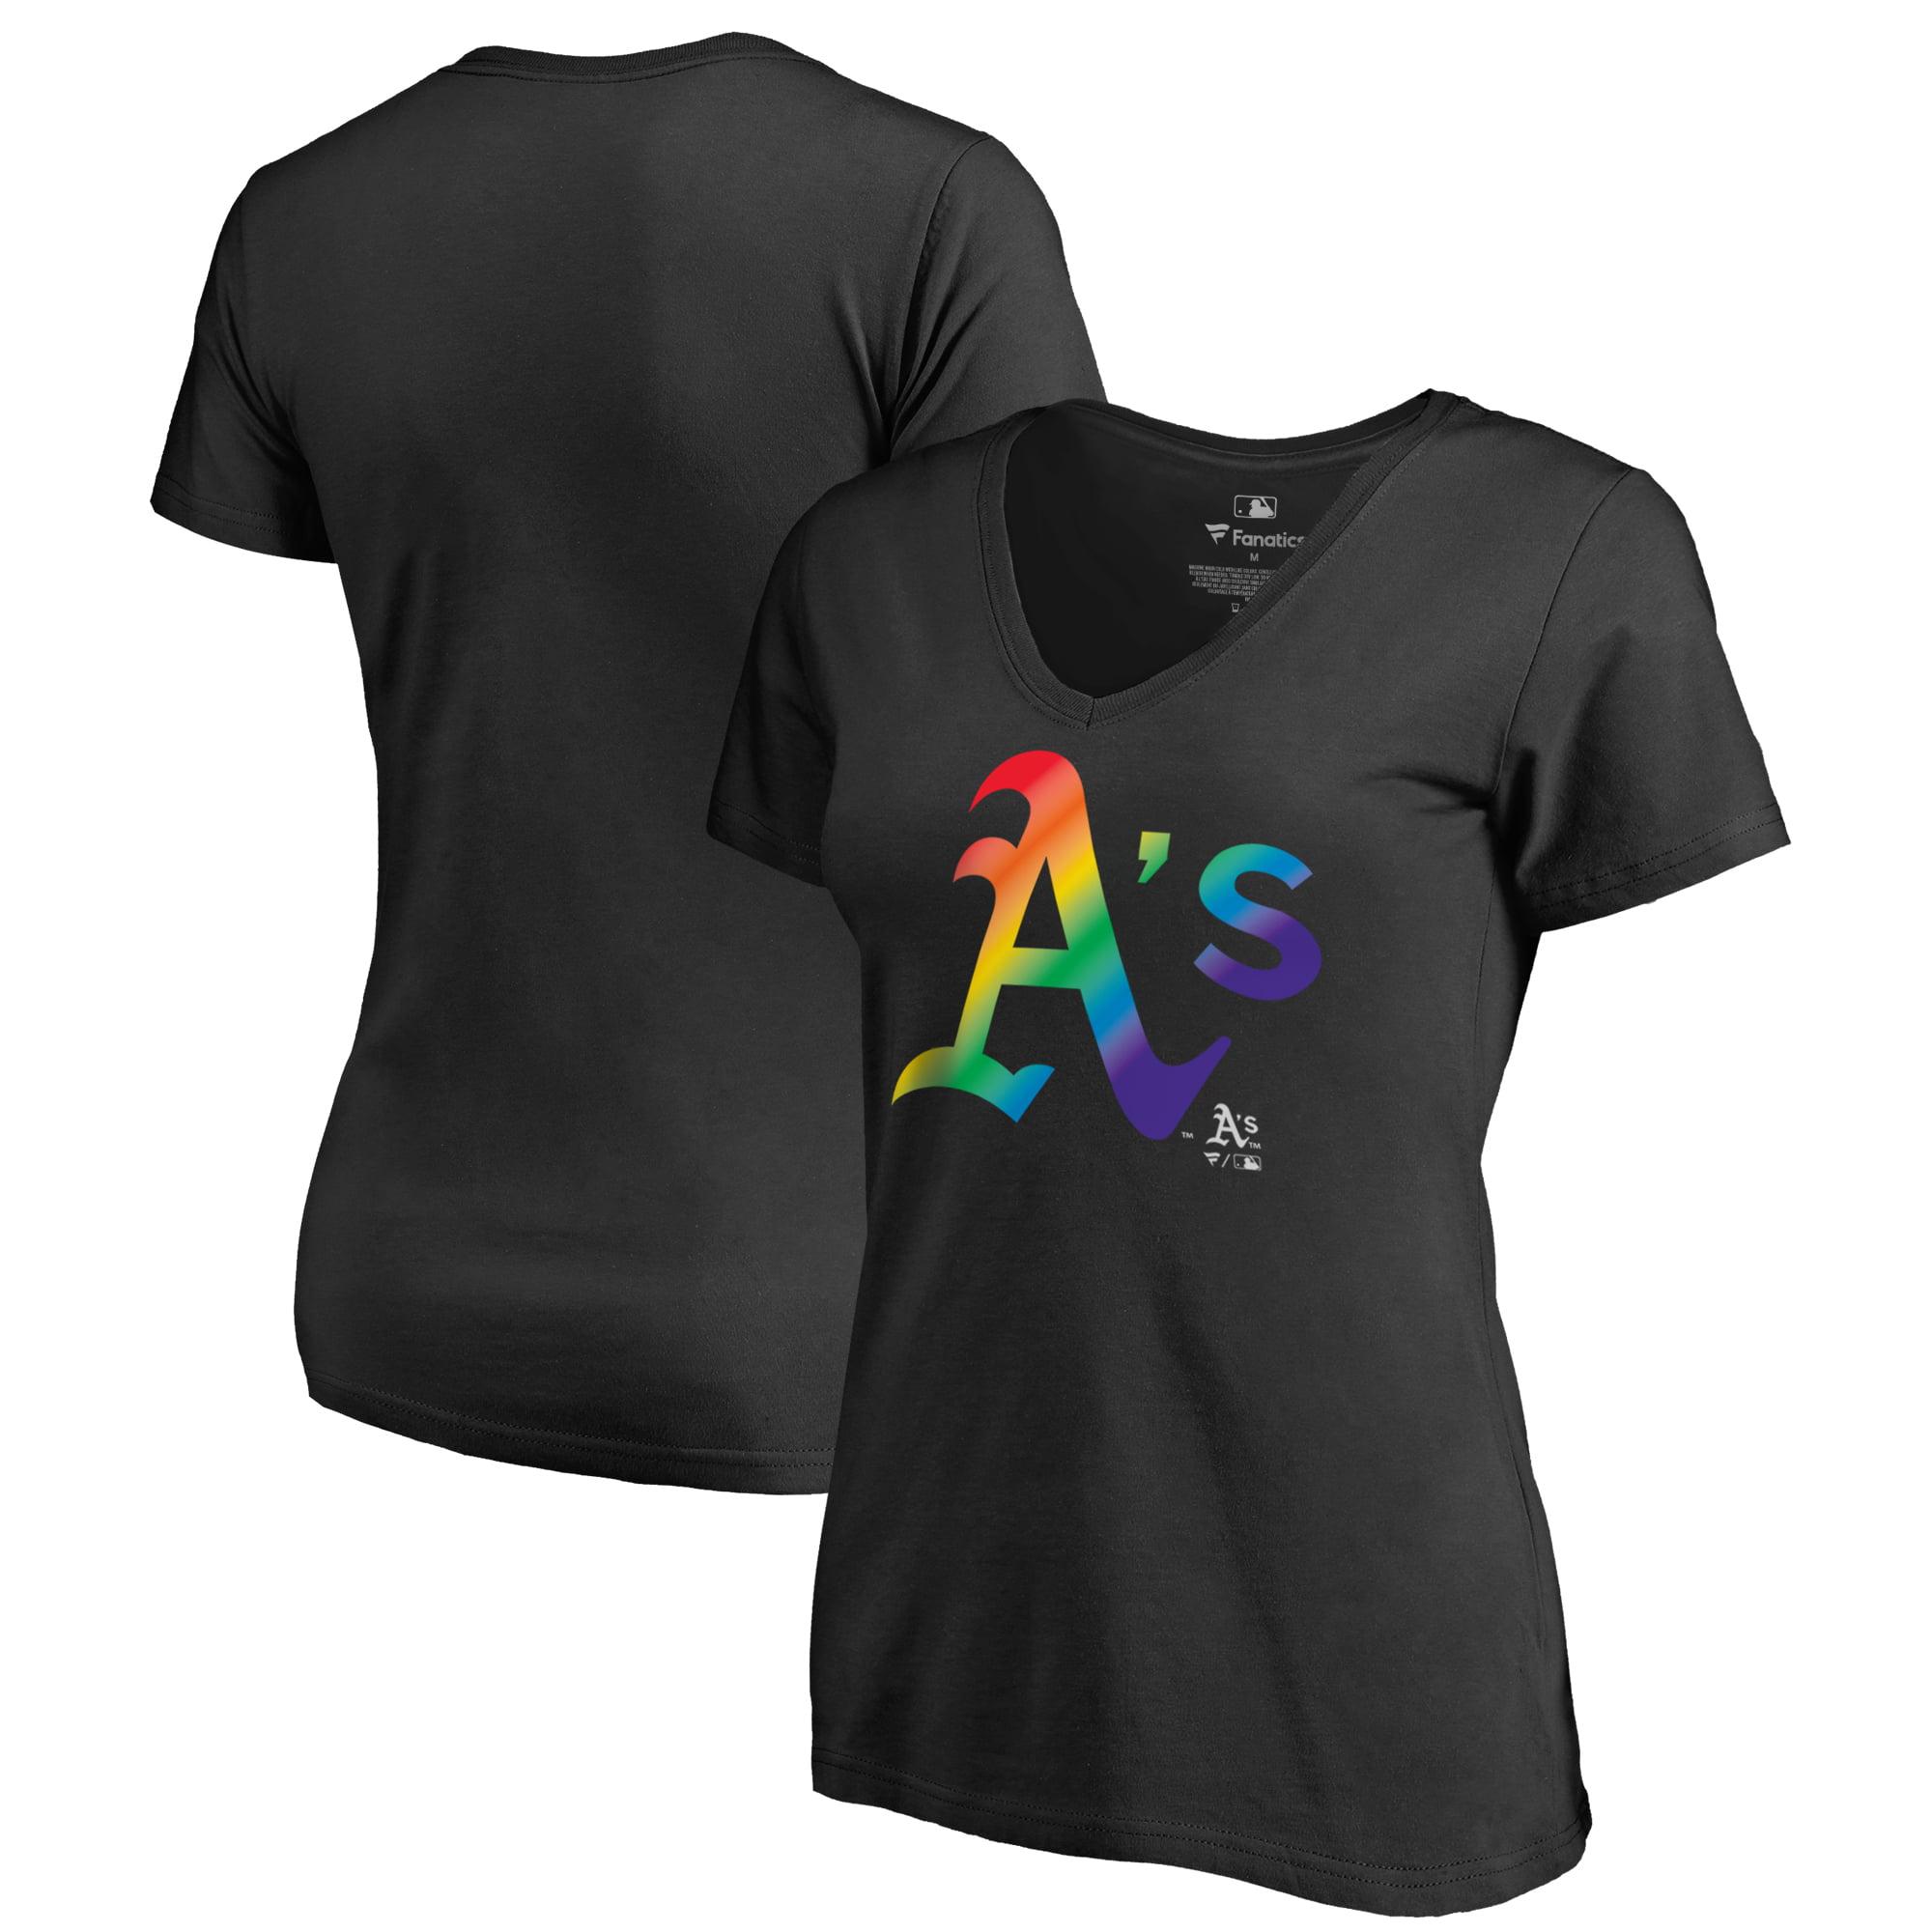 Oakland Athletics Fanatics Branded Women's Plus Sizes Pride T-Shirt - Black